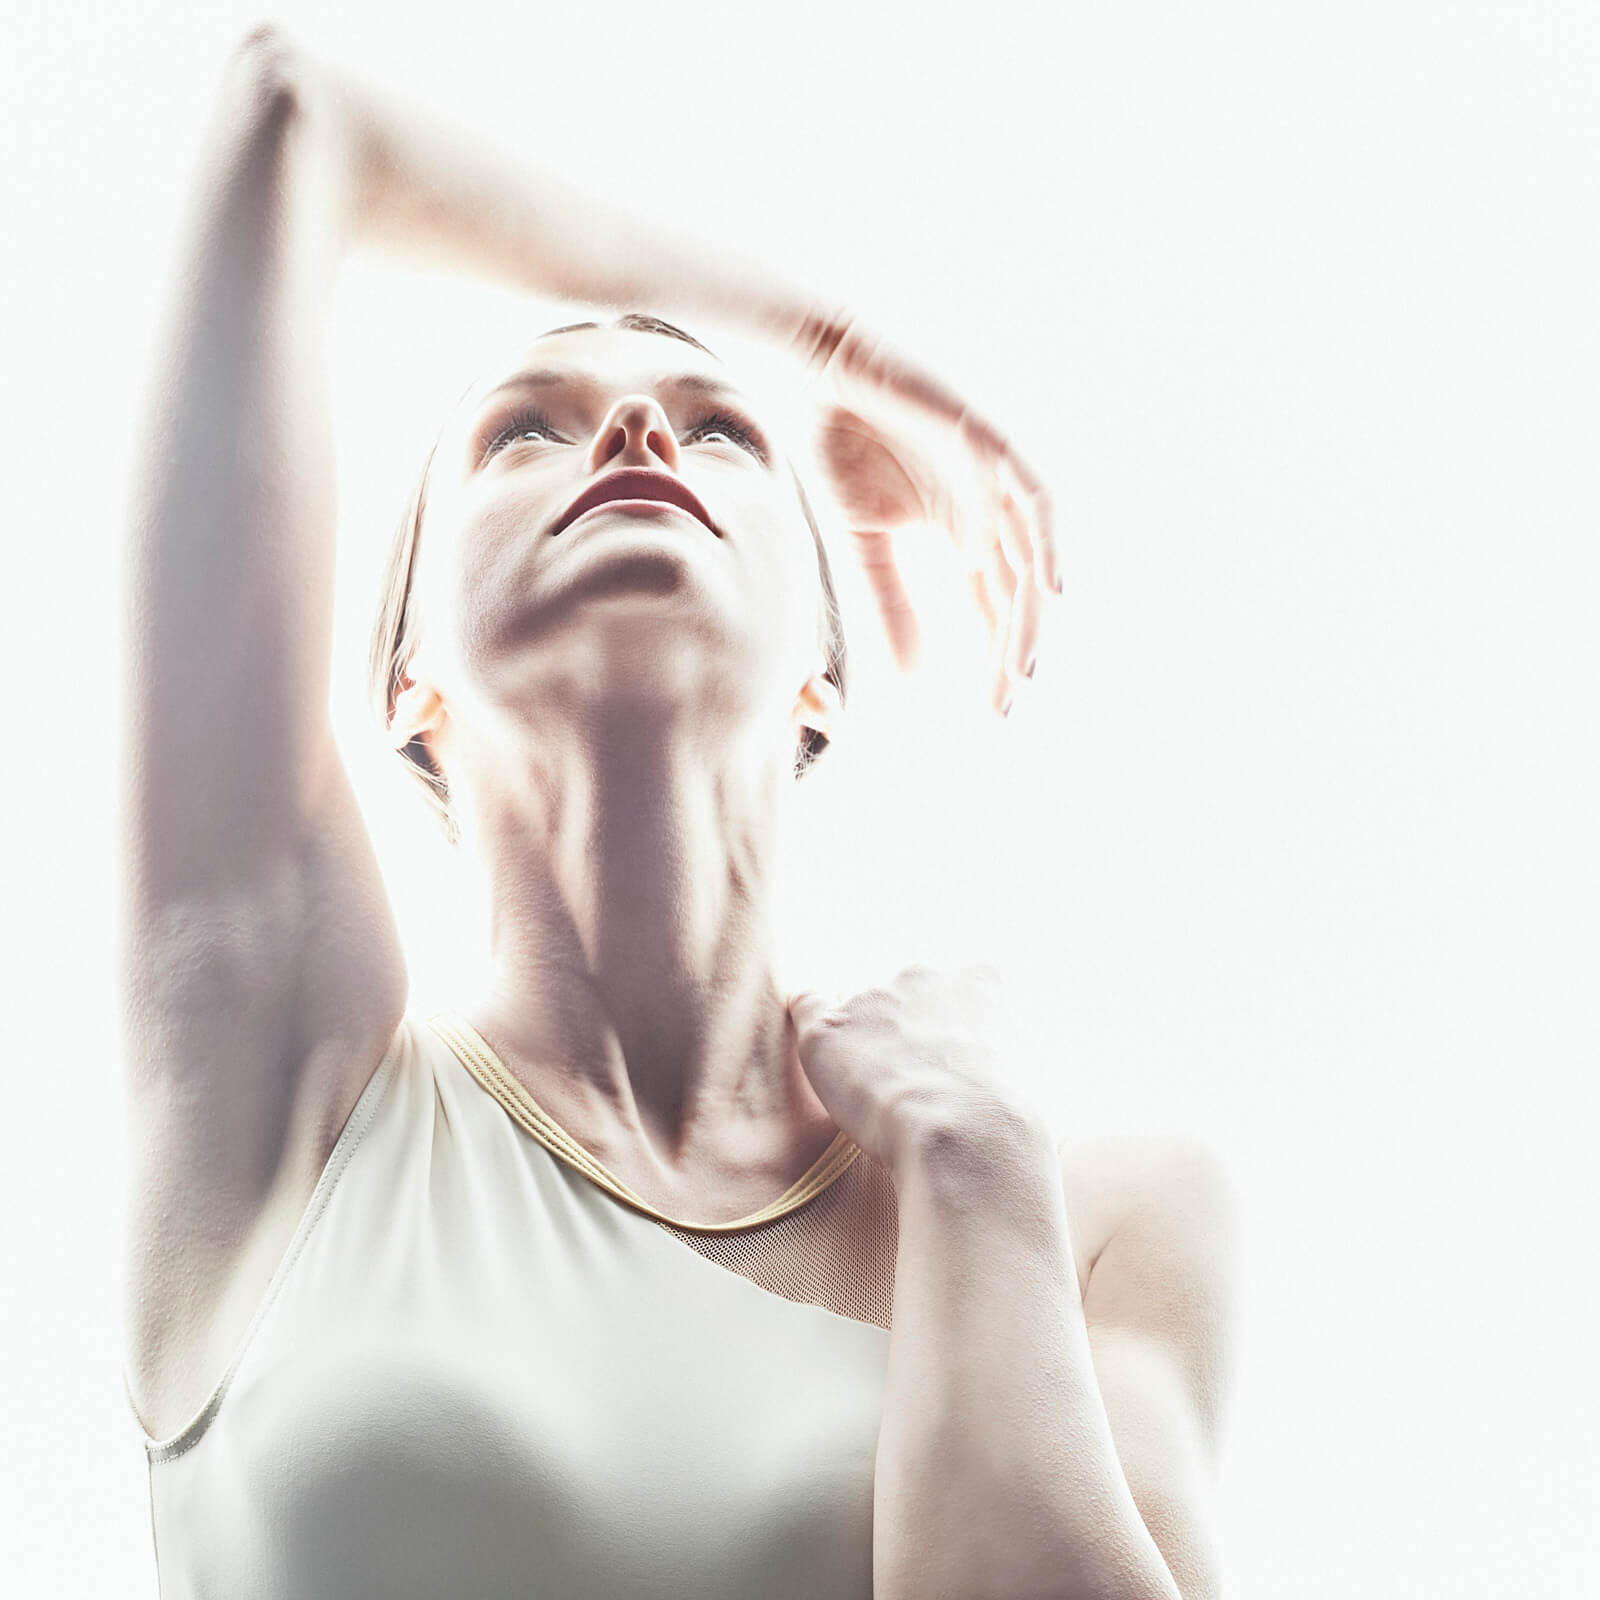 Danza Matteo Nanni